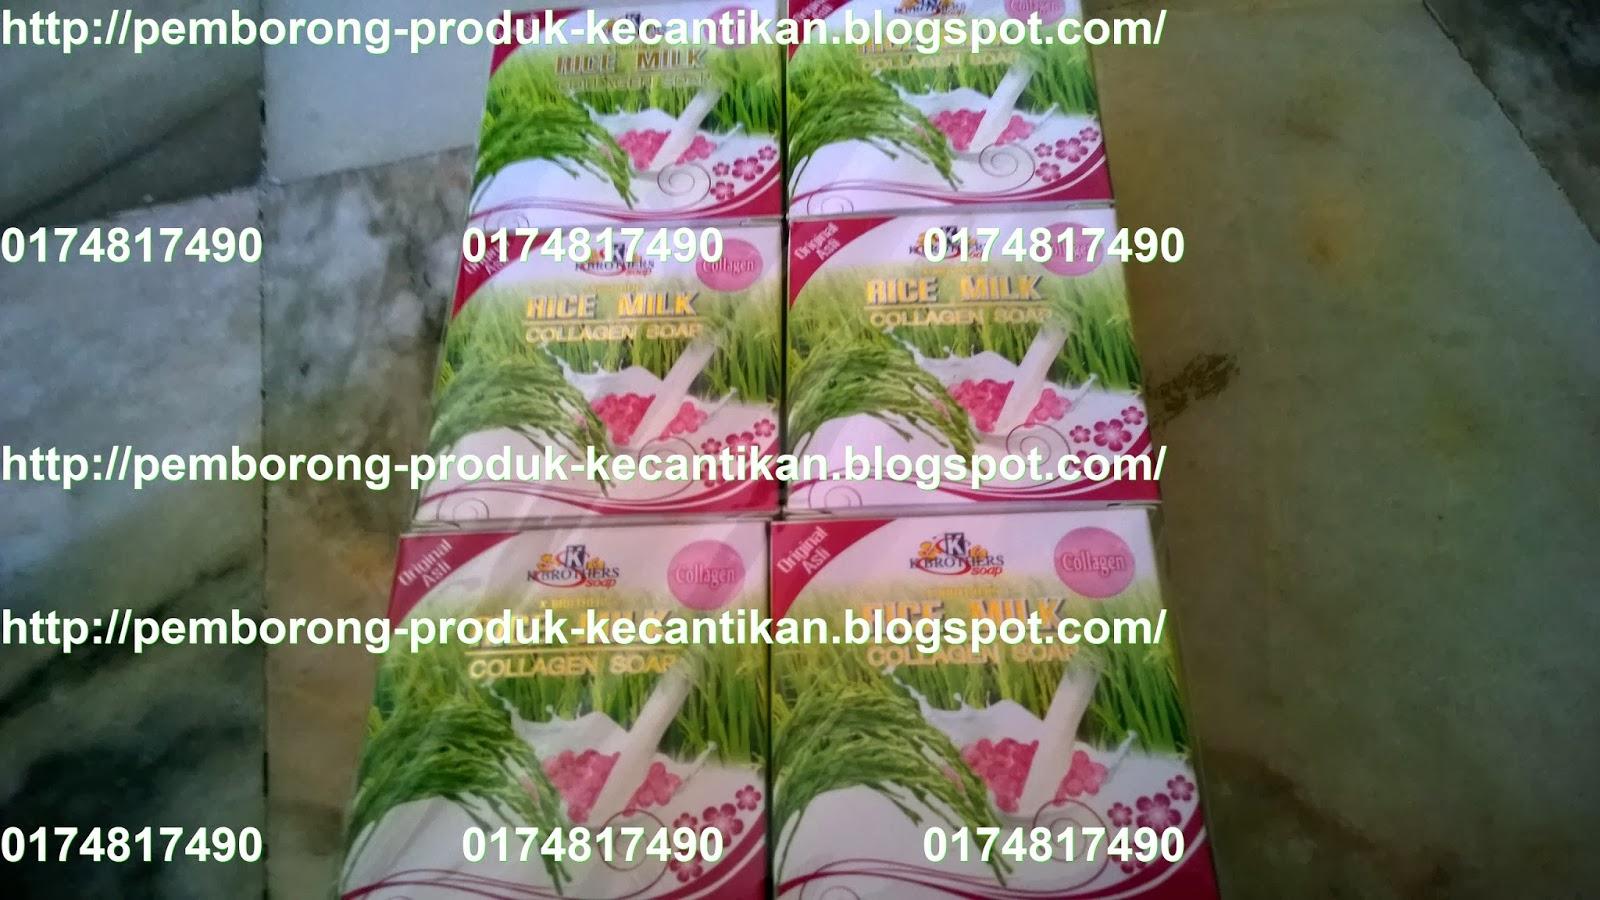 Menawarkan Produk Kecantikan Serta Kesihatan Dengan Harga Murah Sabun Susu Collagen Beras K Brothers